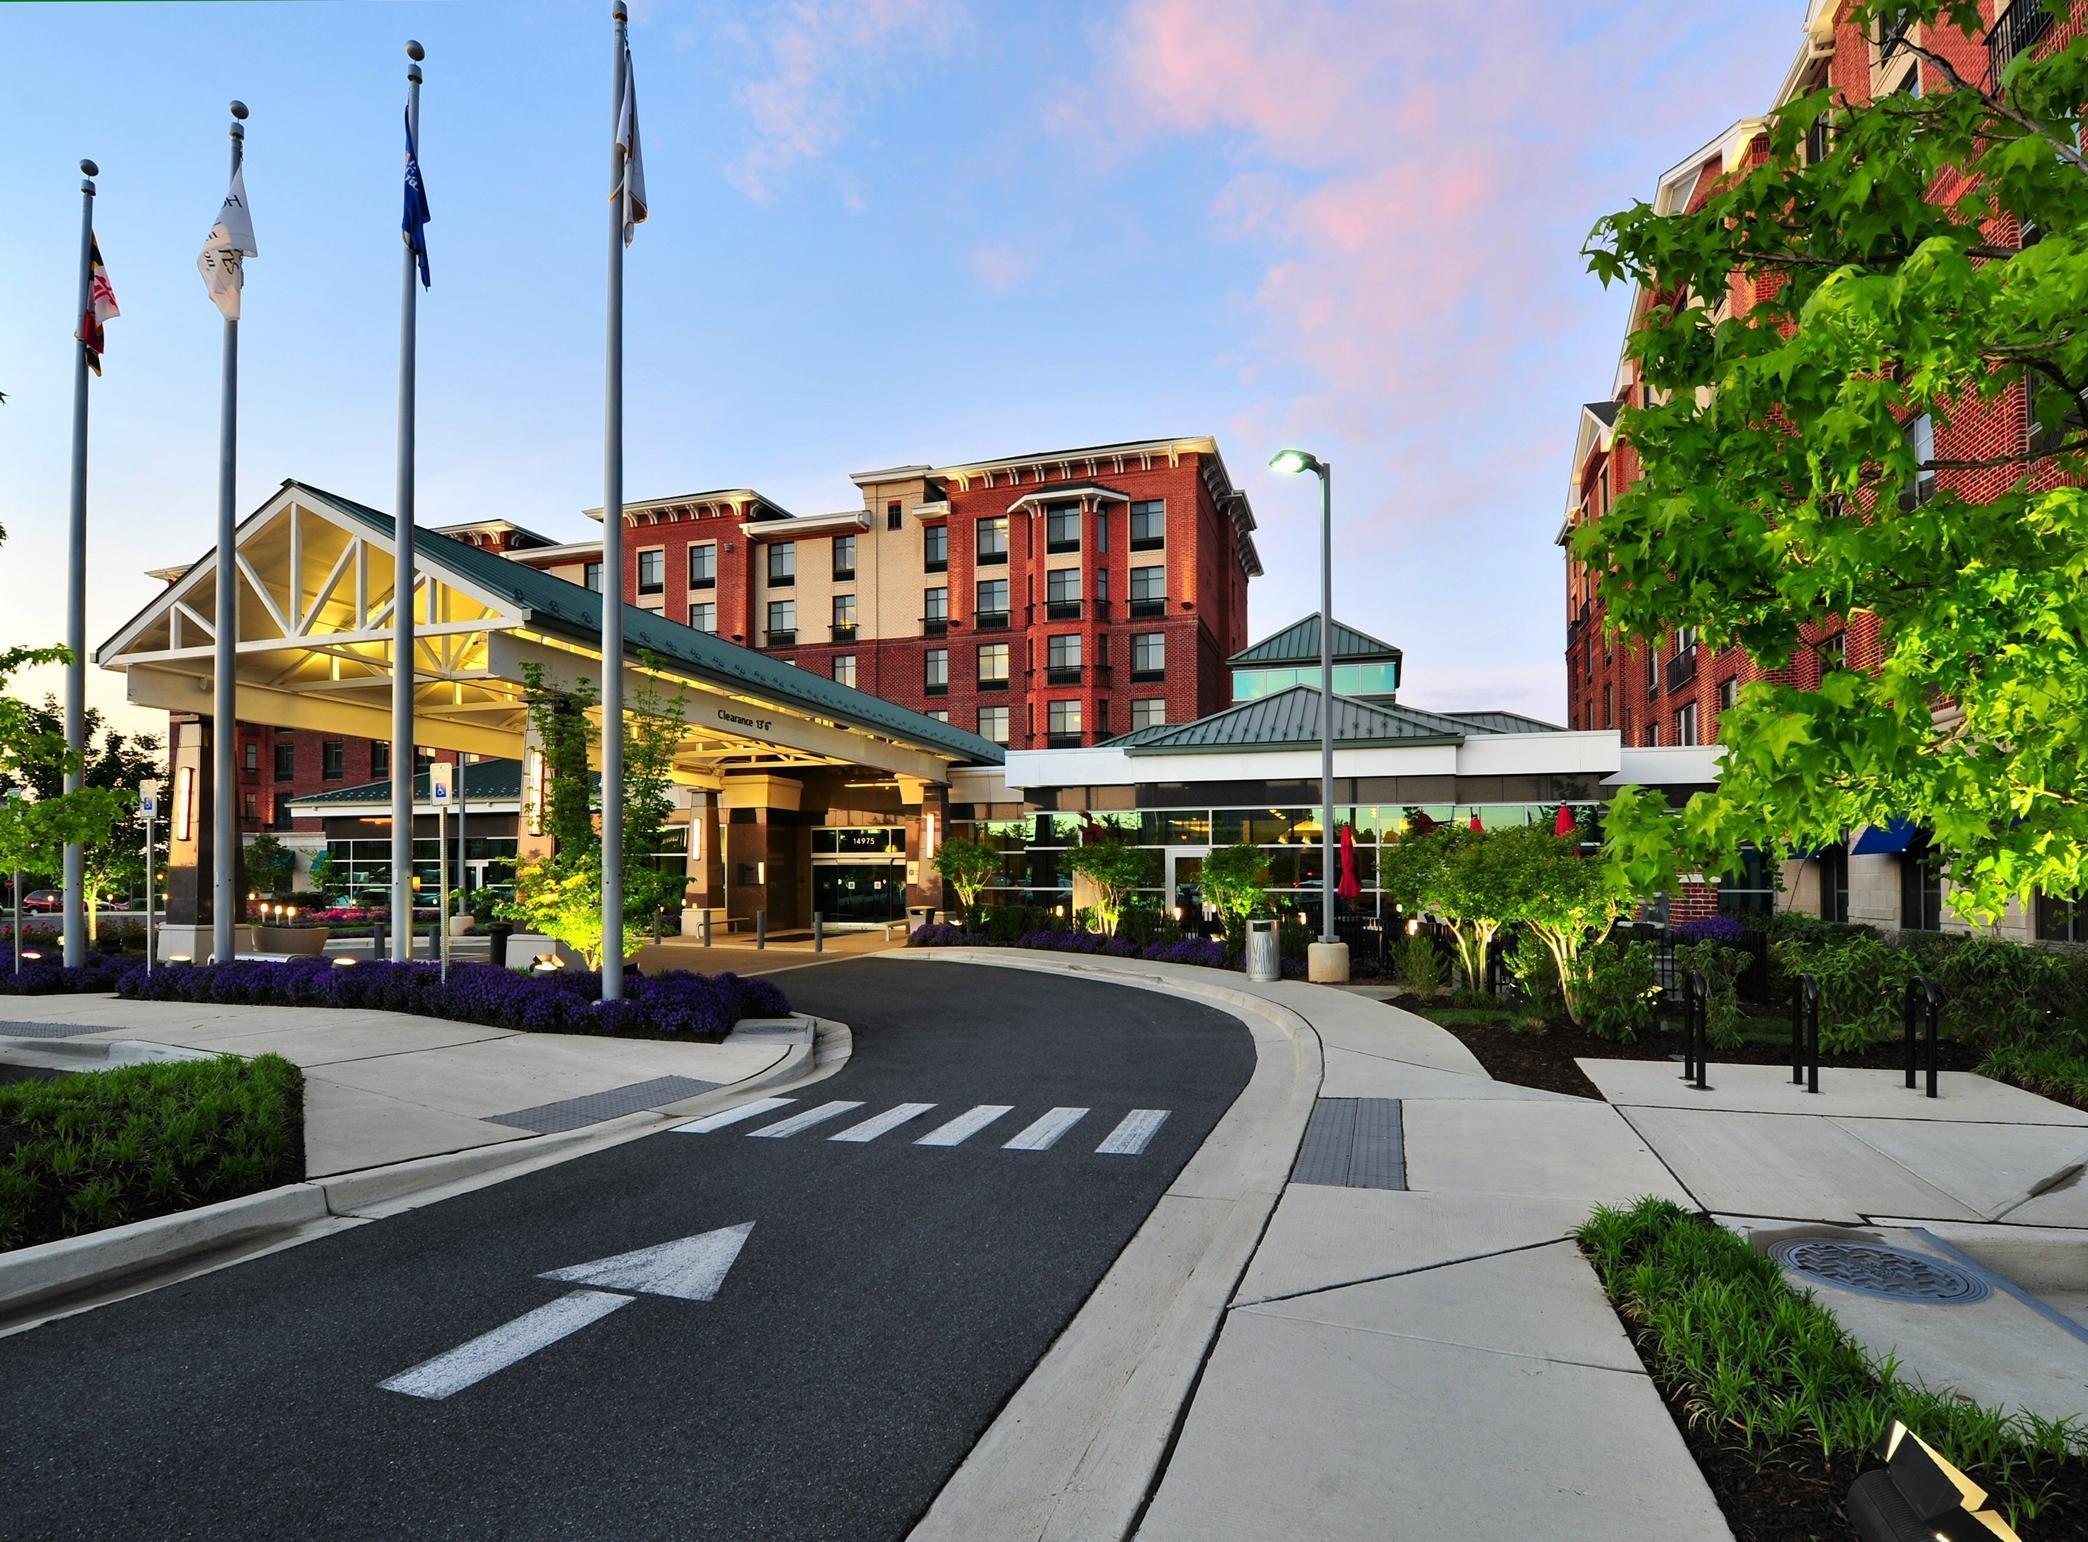 Hilton Garden Inn Rockville-Gaithersburg image 0